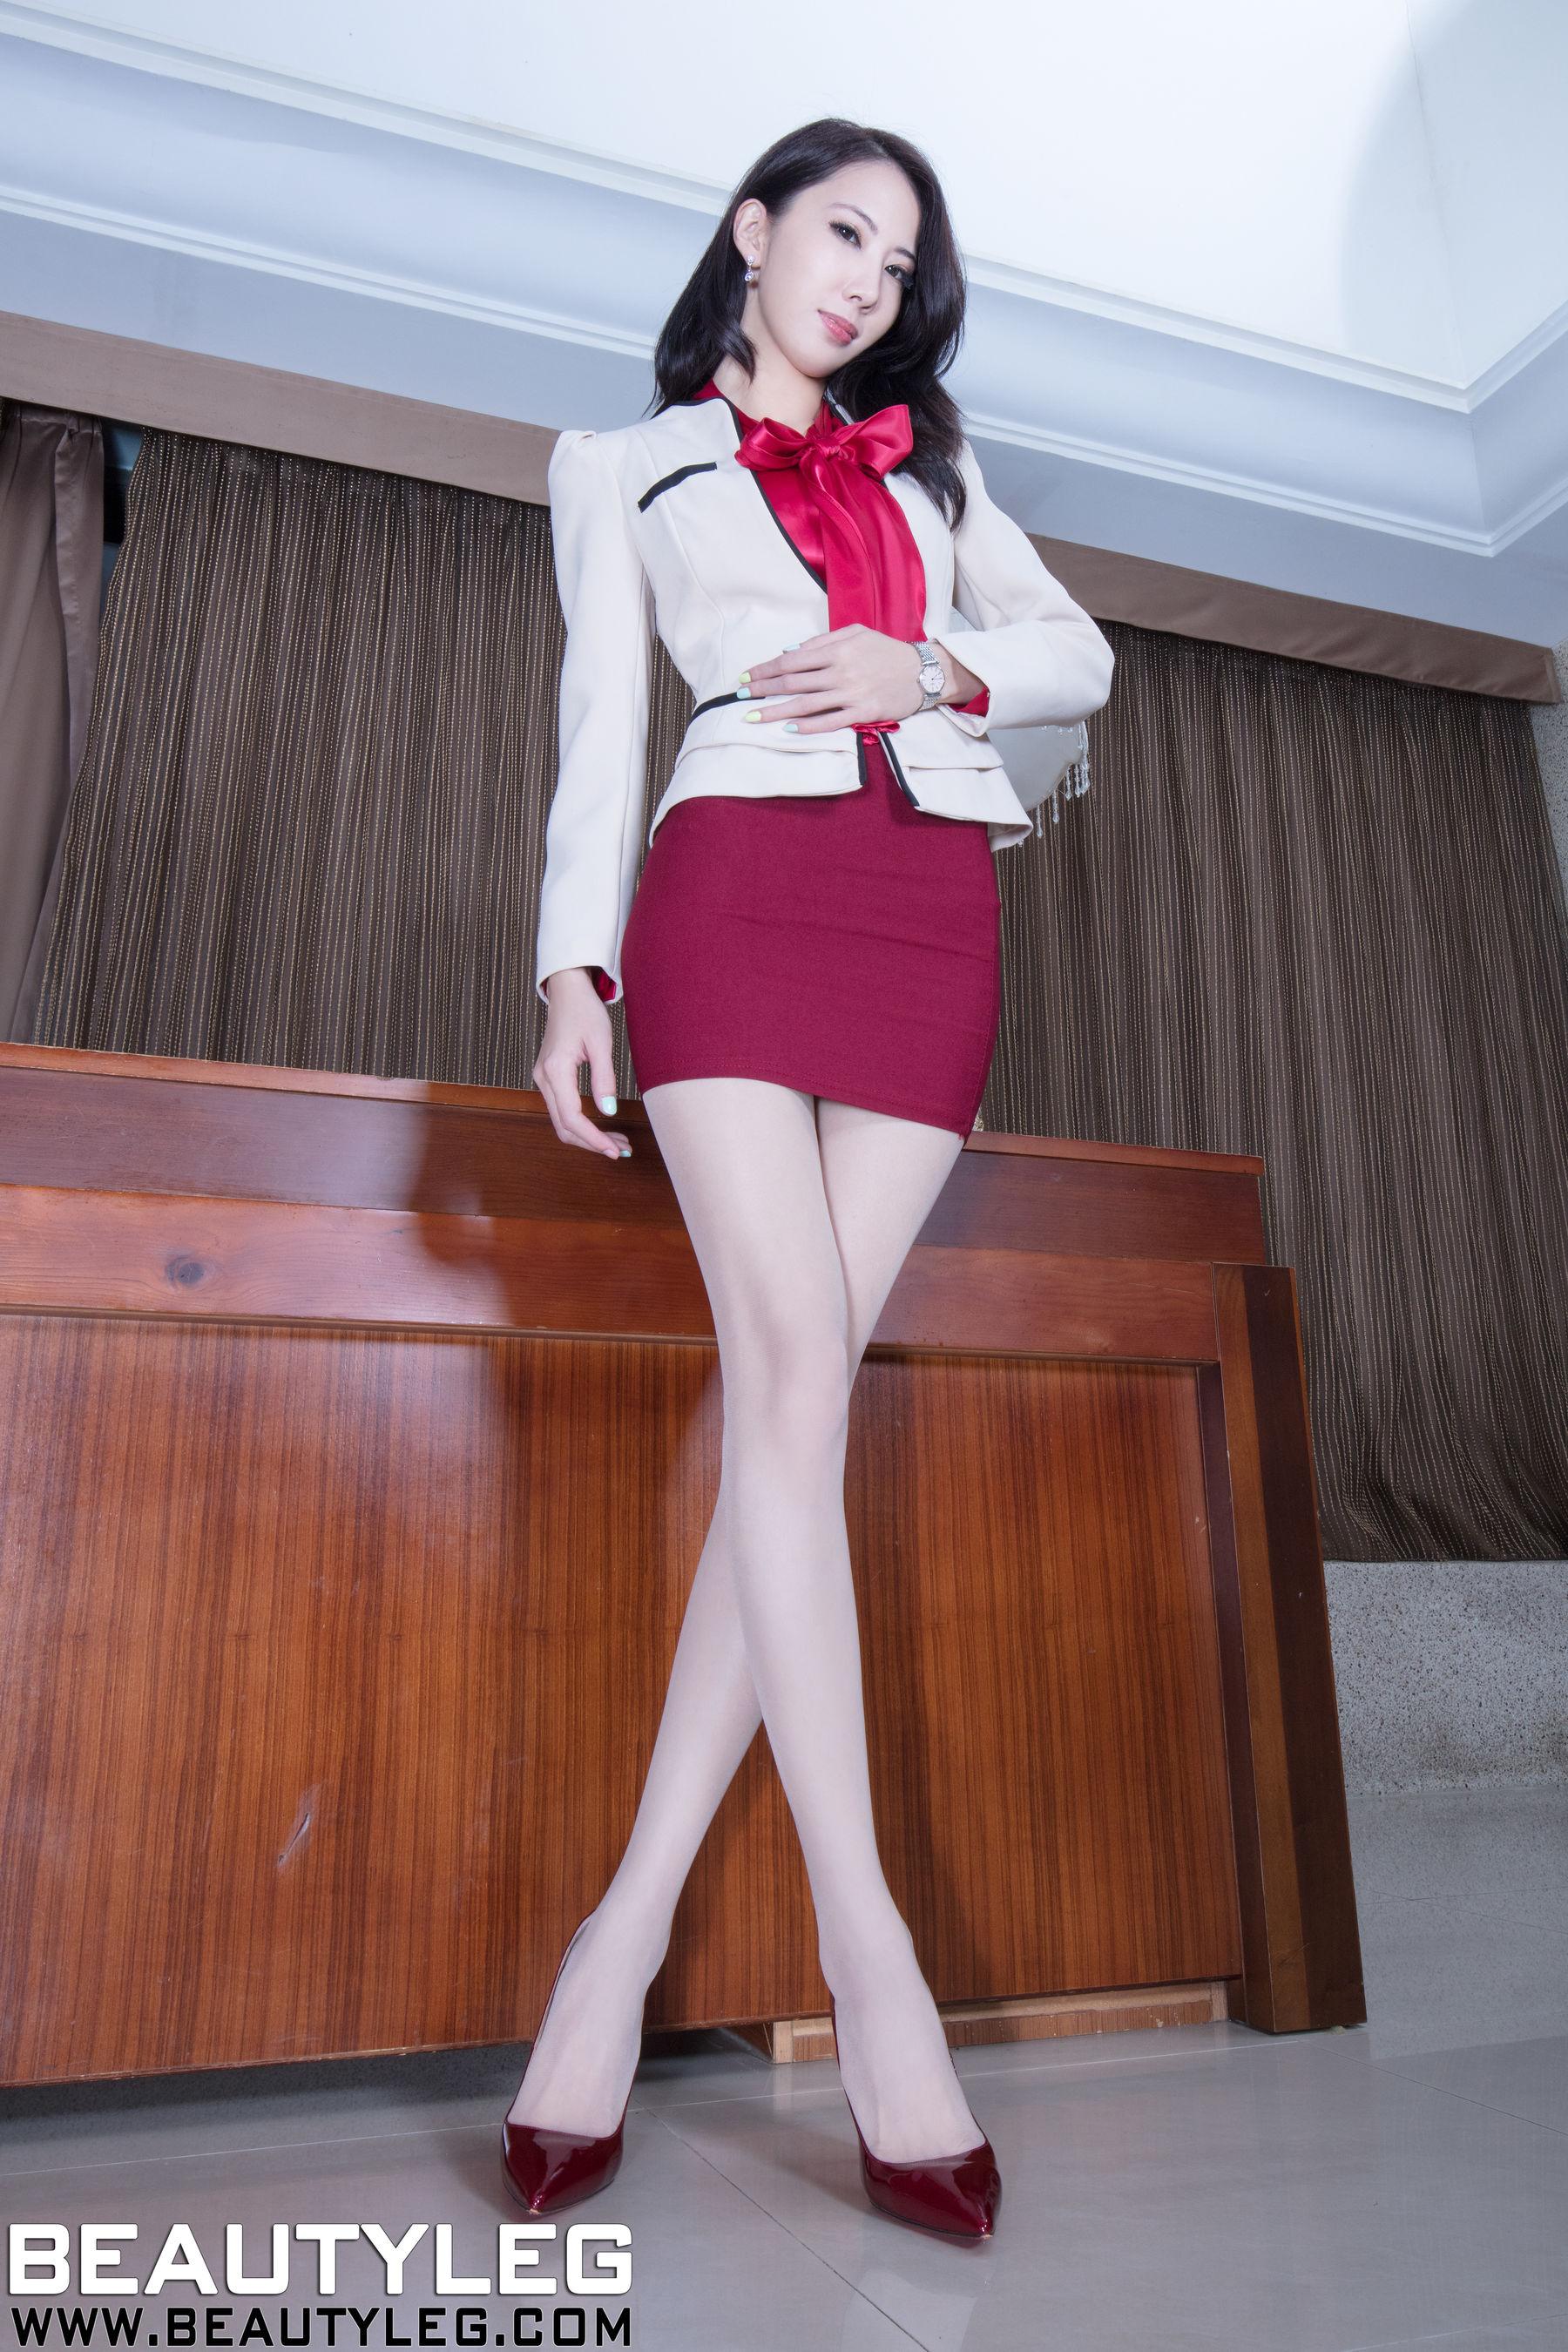 VOL.653 [Beautyleg]美腿高跟长腿美女:童采萱(Beautyleg Yoyo,腿模Yoyo)高品质写真套图(56P)